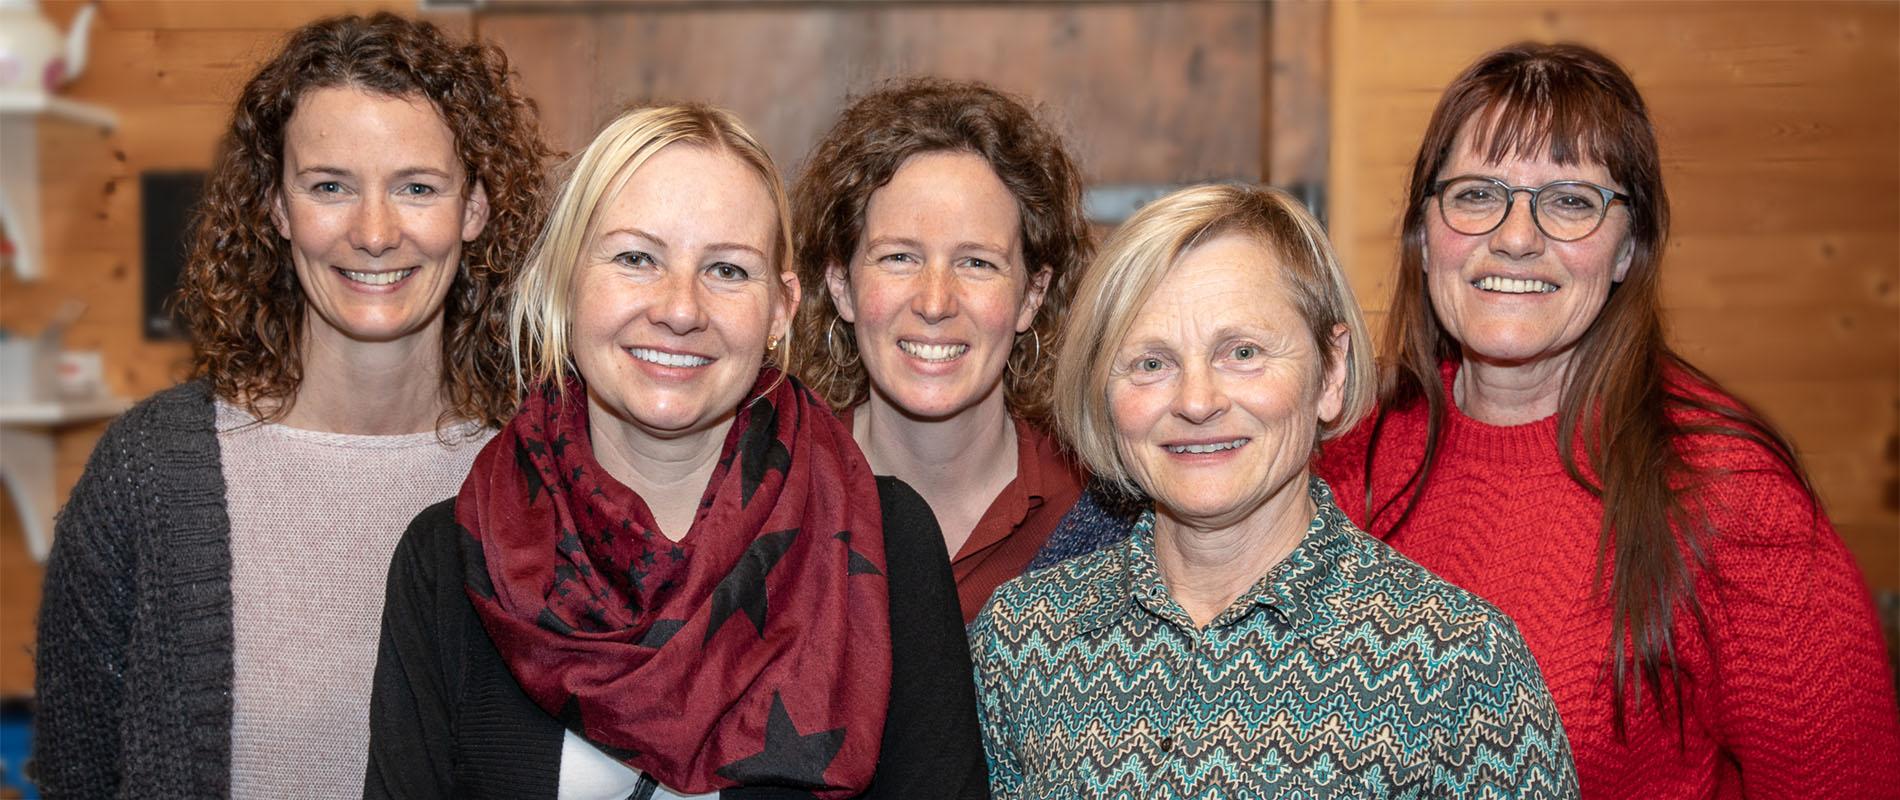 Marianne Liesch, Nadine Jermann, Nadja Oberluggauer, Judith Pandolfi, Rita Insel